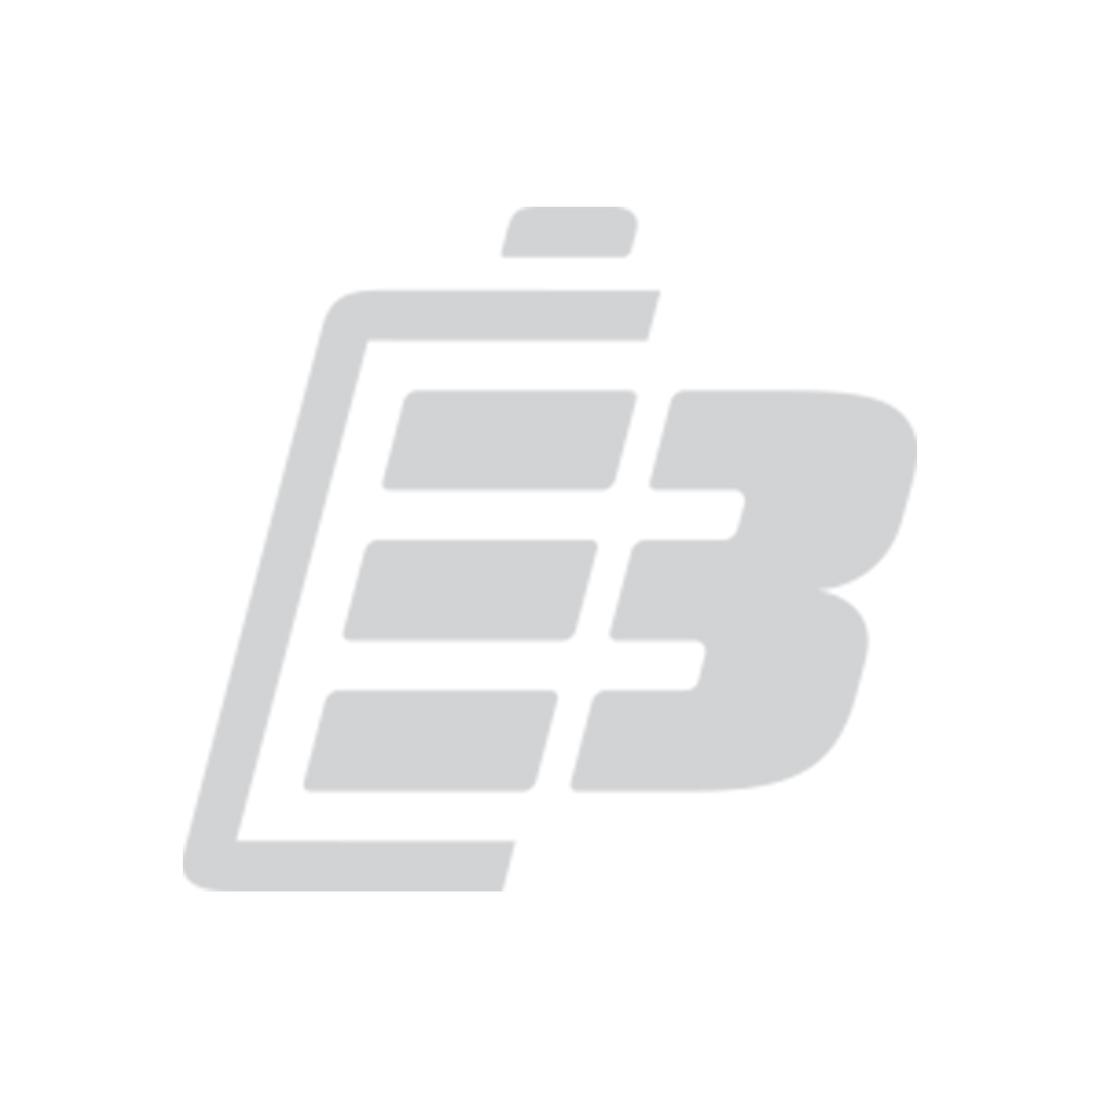 Laptop battery Acer Aspire Ultrabook S3_1